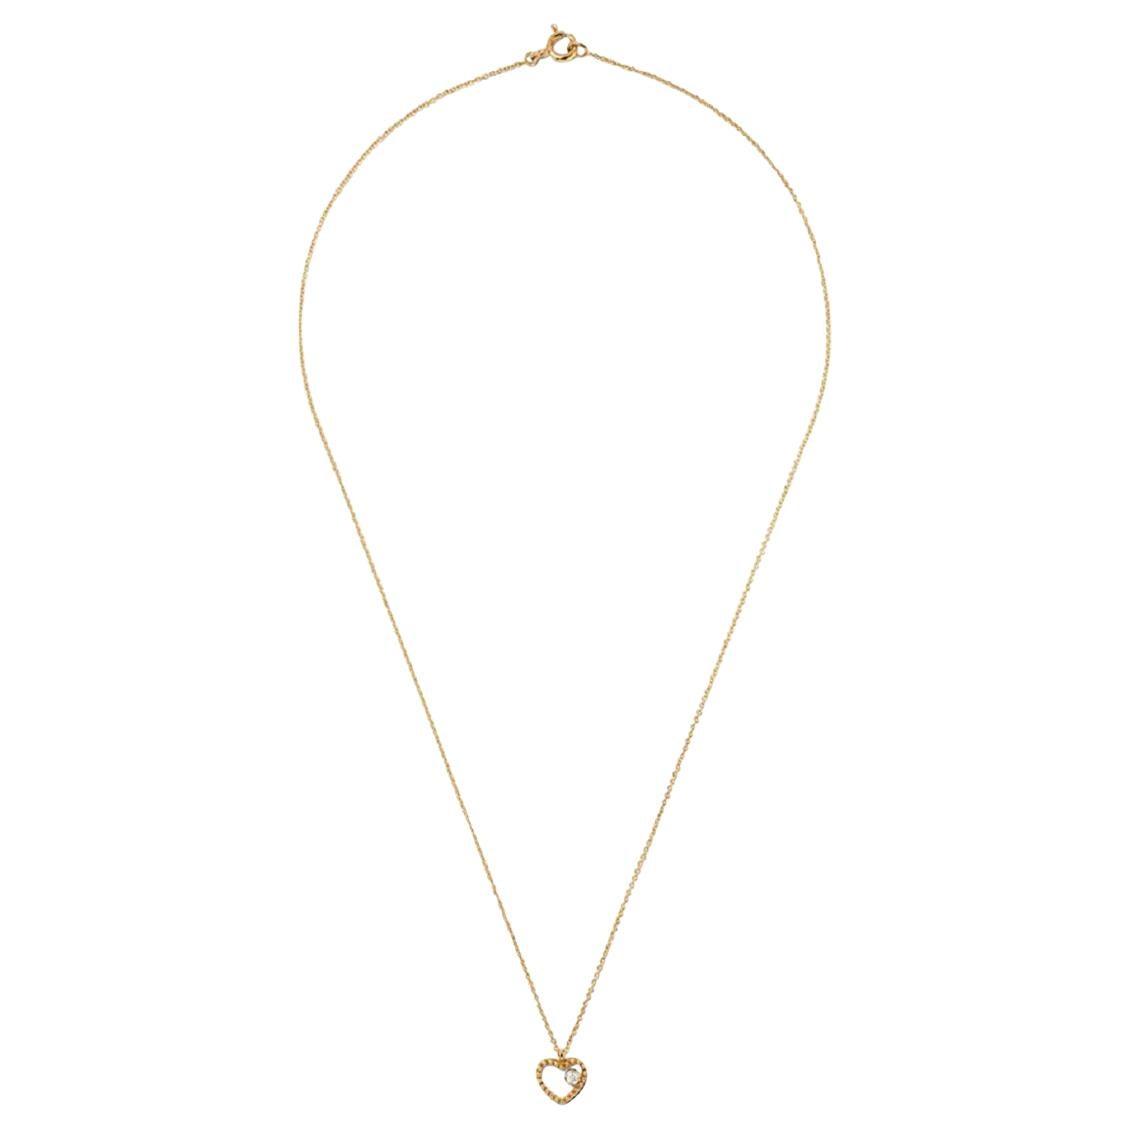 18 Karat Yellow Gold Mye Heart Beading Diamond Necklace